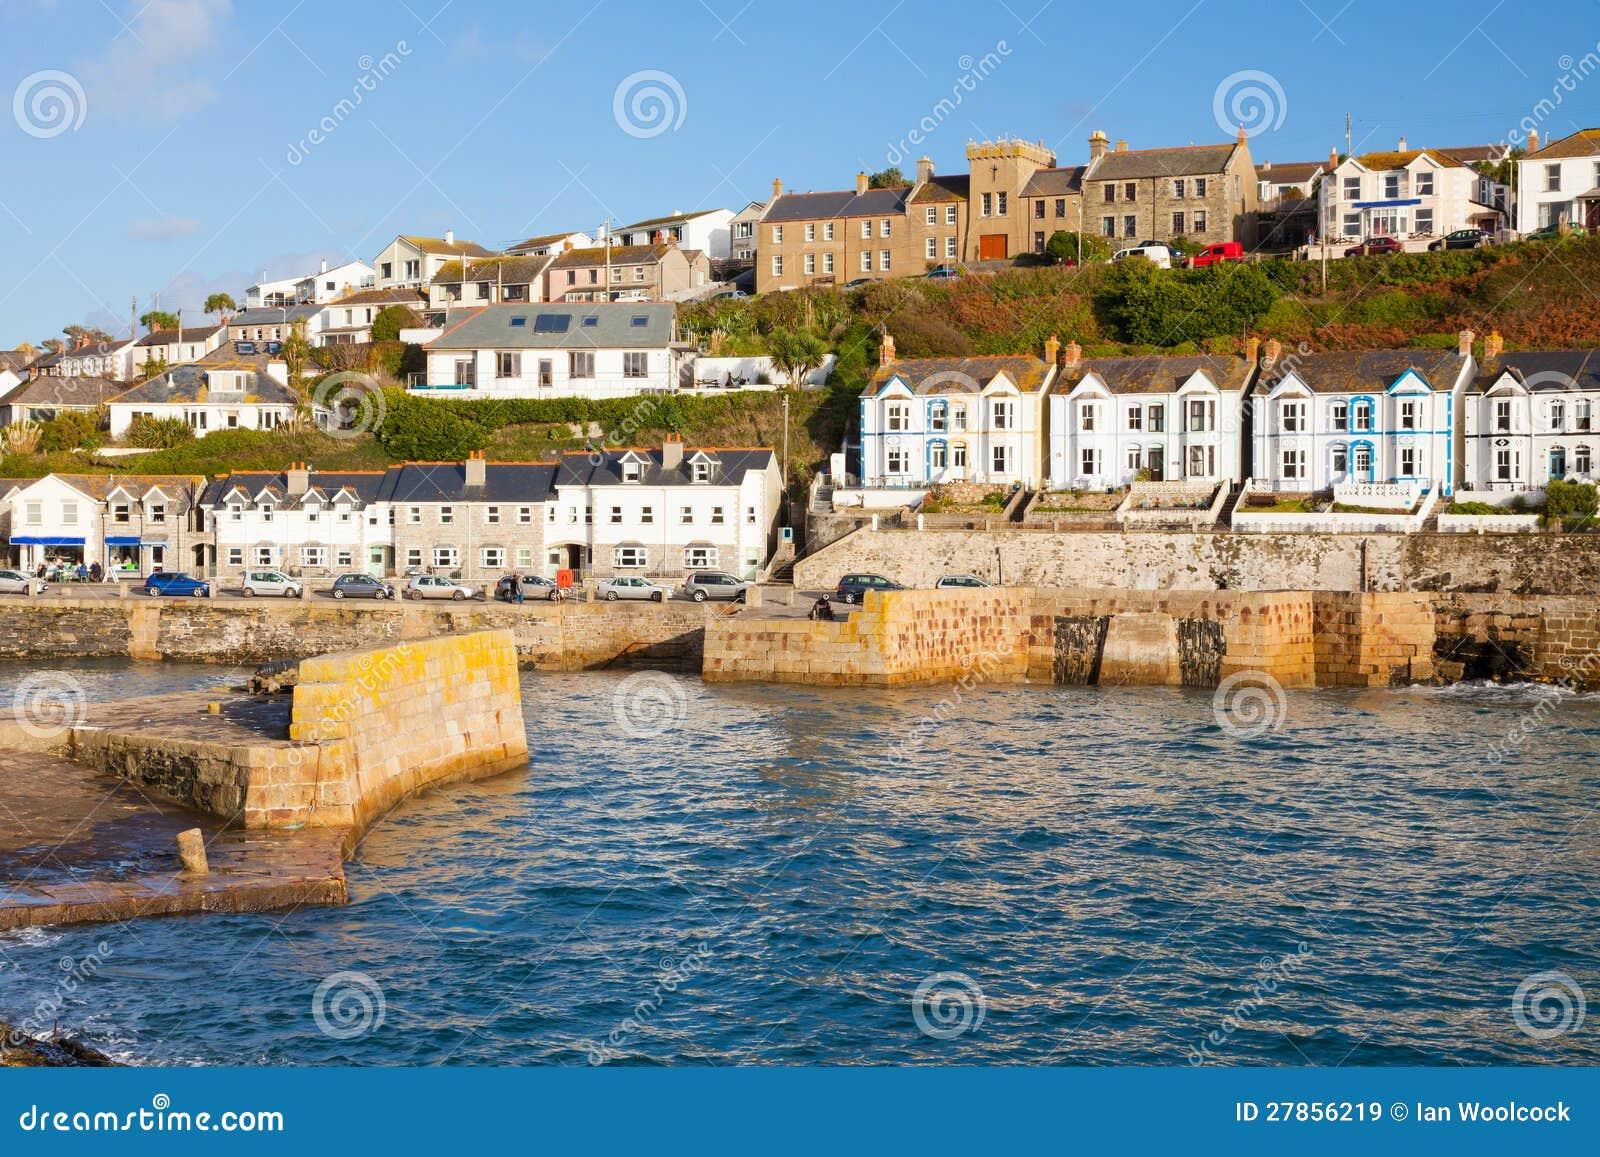 Porthleven Cornwall England